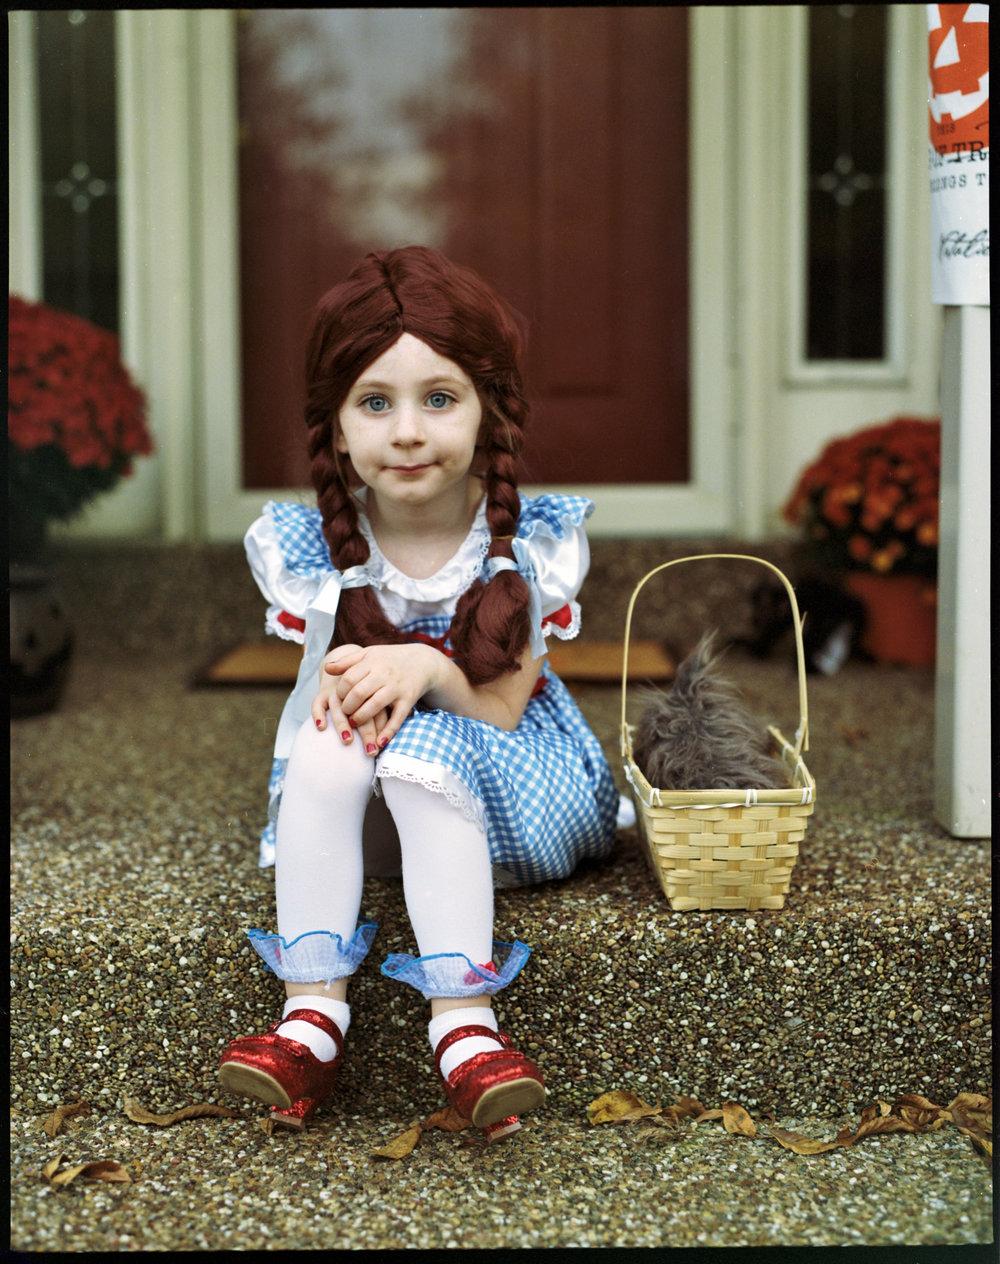 At Home with Dorothy | Pentax 67ii | Kodak Portra | Ellen Goodman